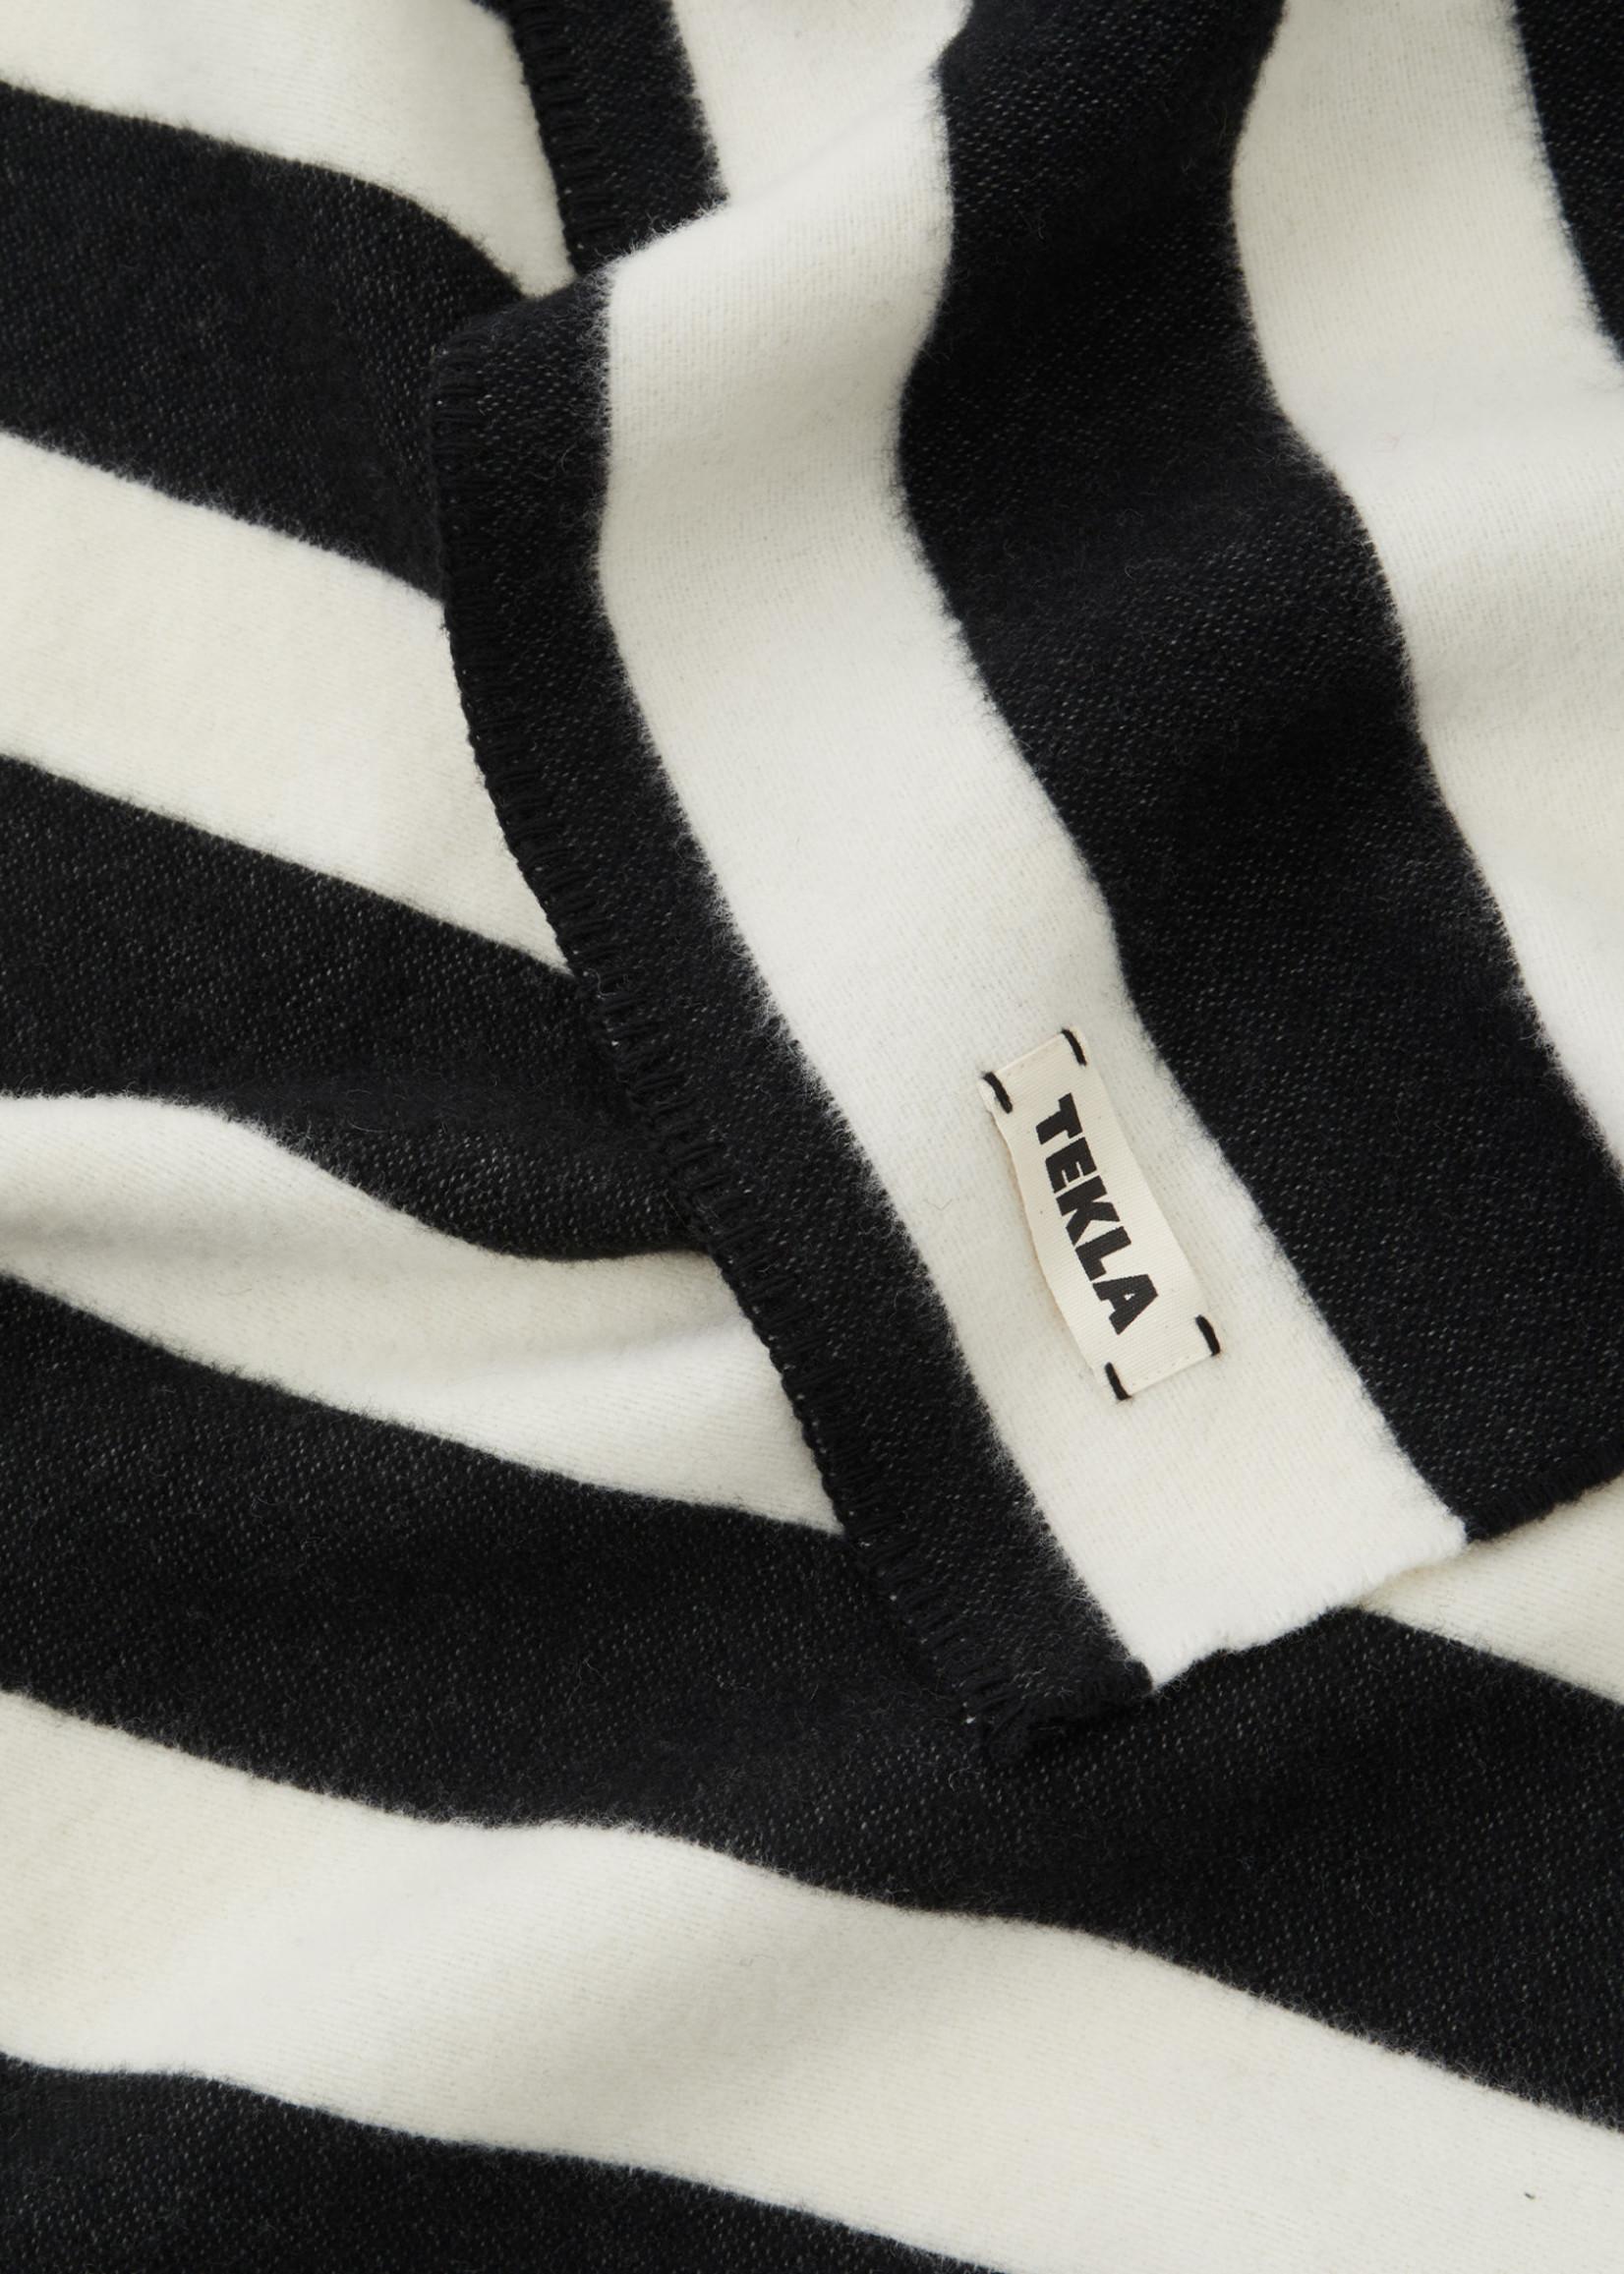 TEKLA Wool Throw Blanket in Black and White Stripe